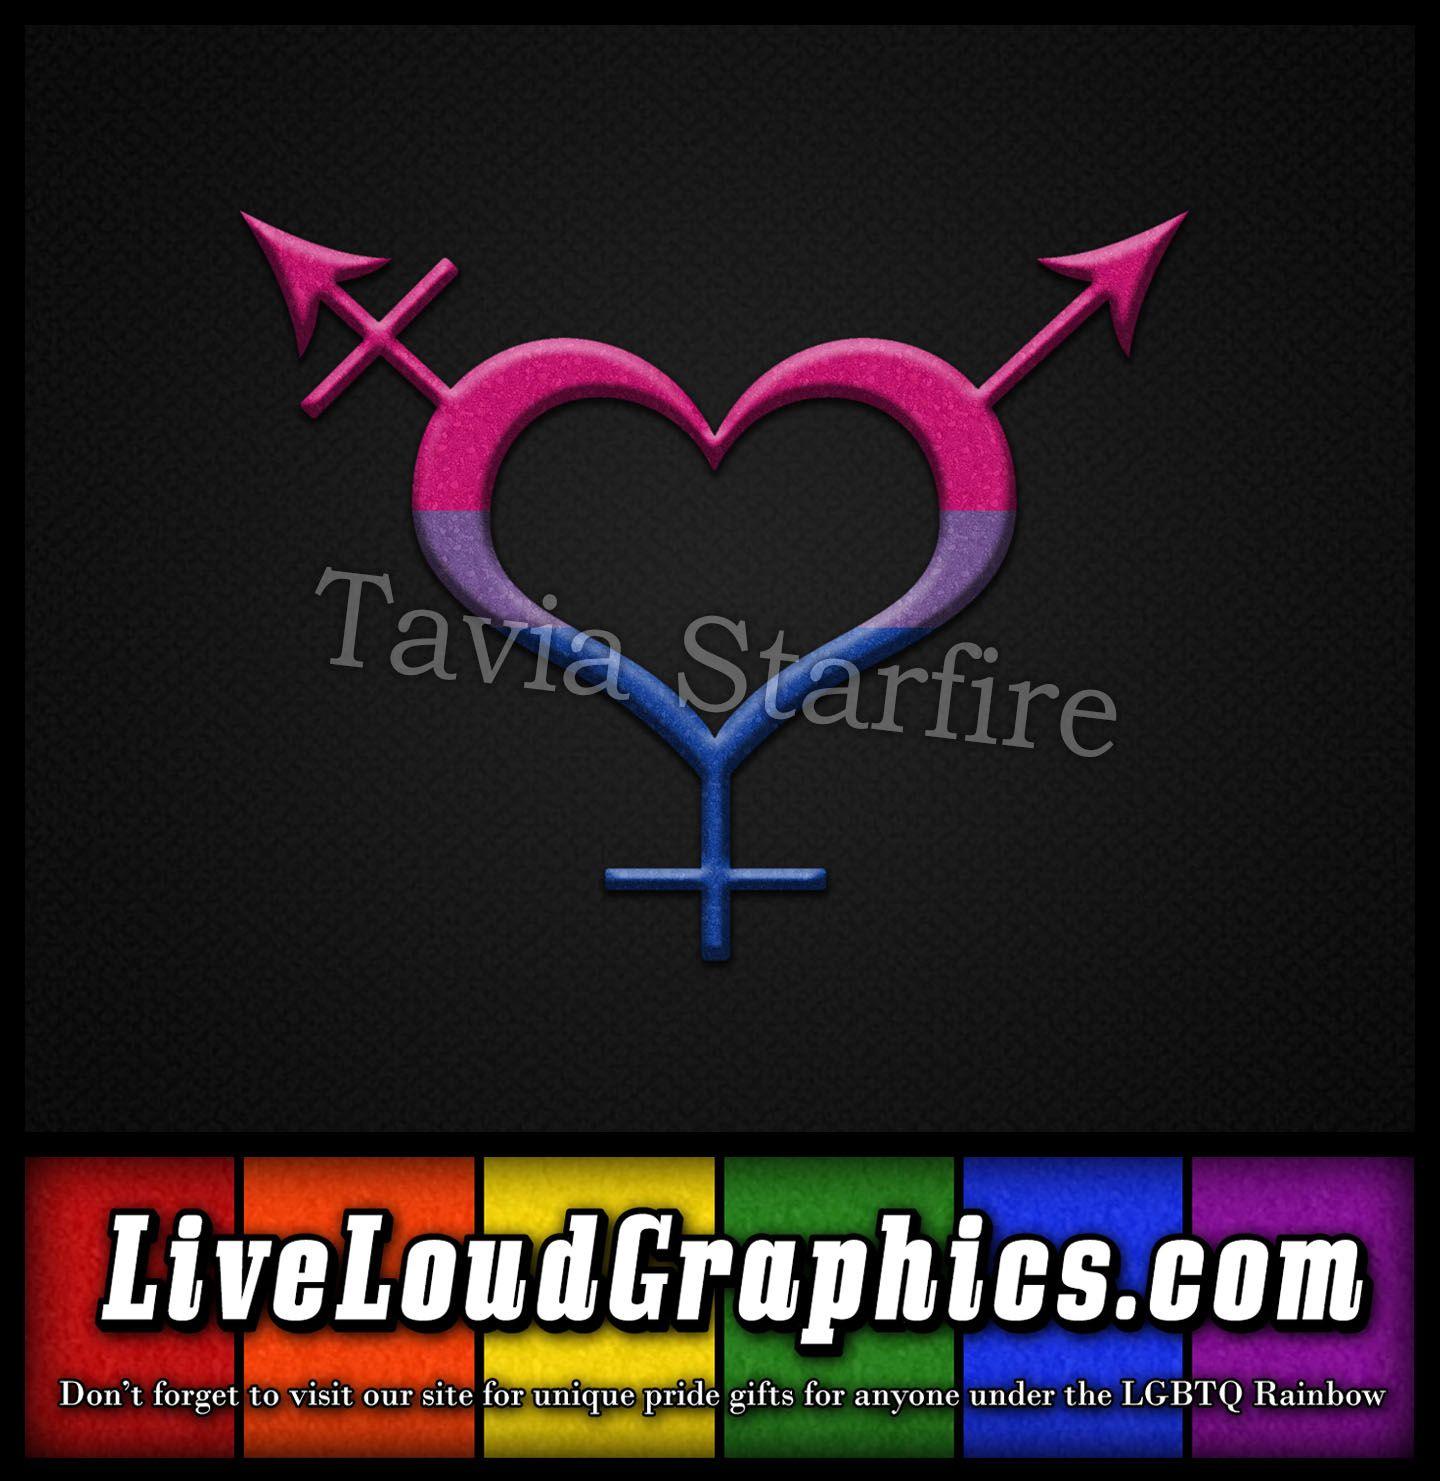 Bisexual Pride Heart Shaped Gender Neutral Symbol In Matching Pride